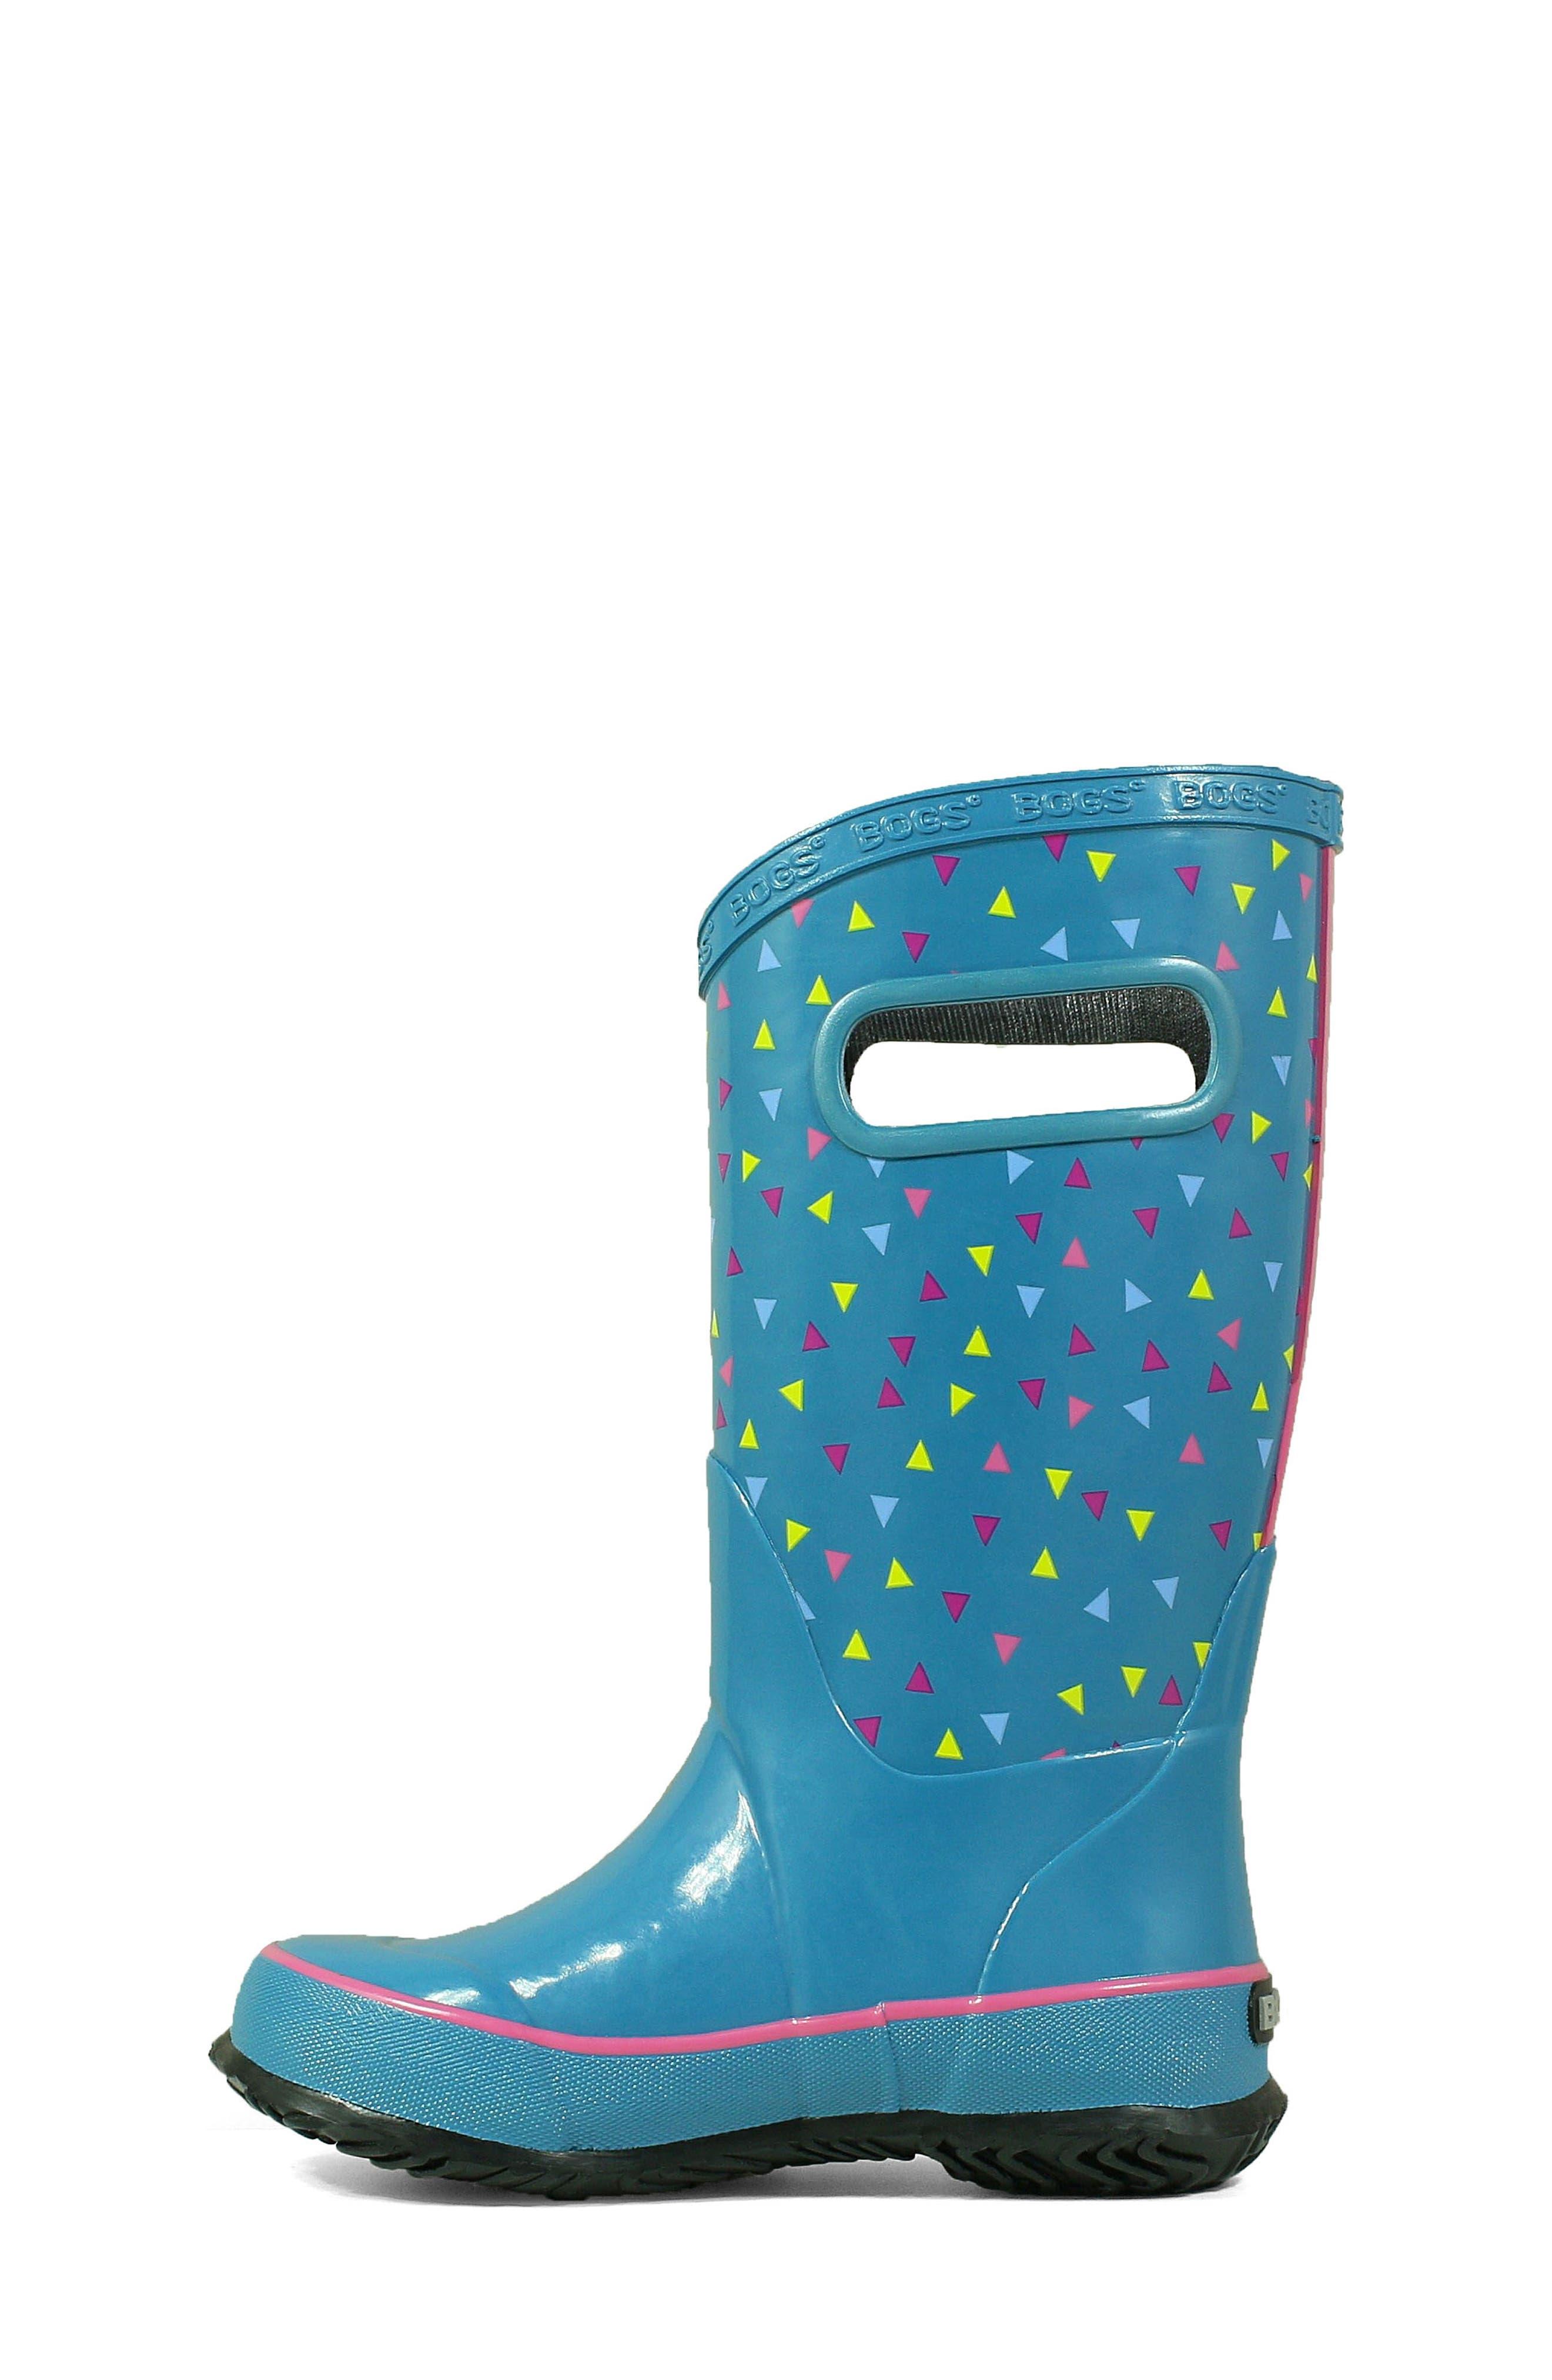 BOGS, Dots Waterproof Rain Boot, Alternate thumbnail 8, color, DARK BLUE MULTI